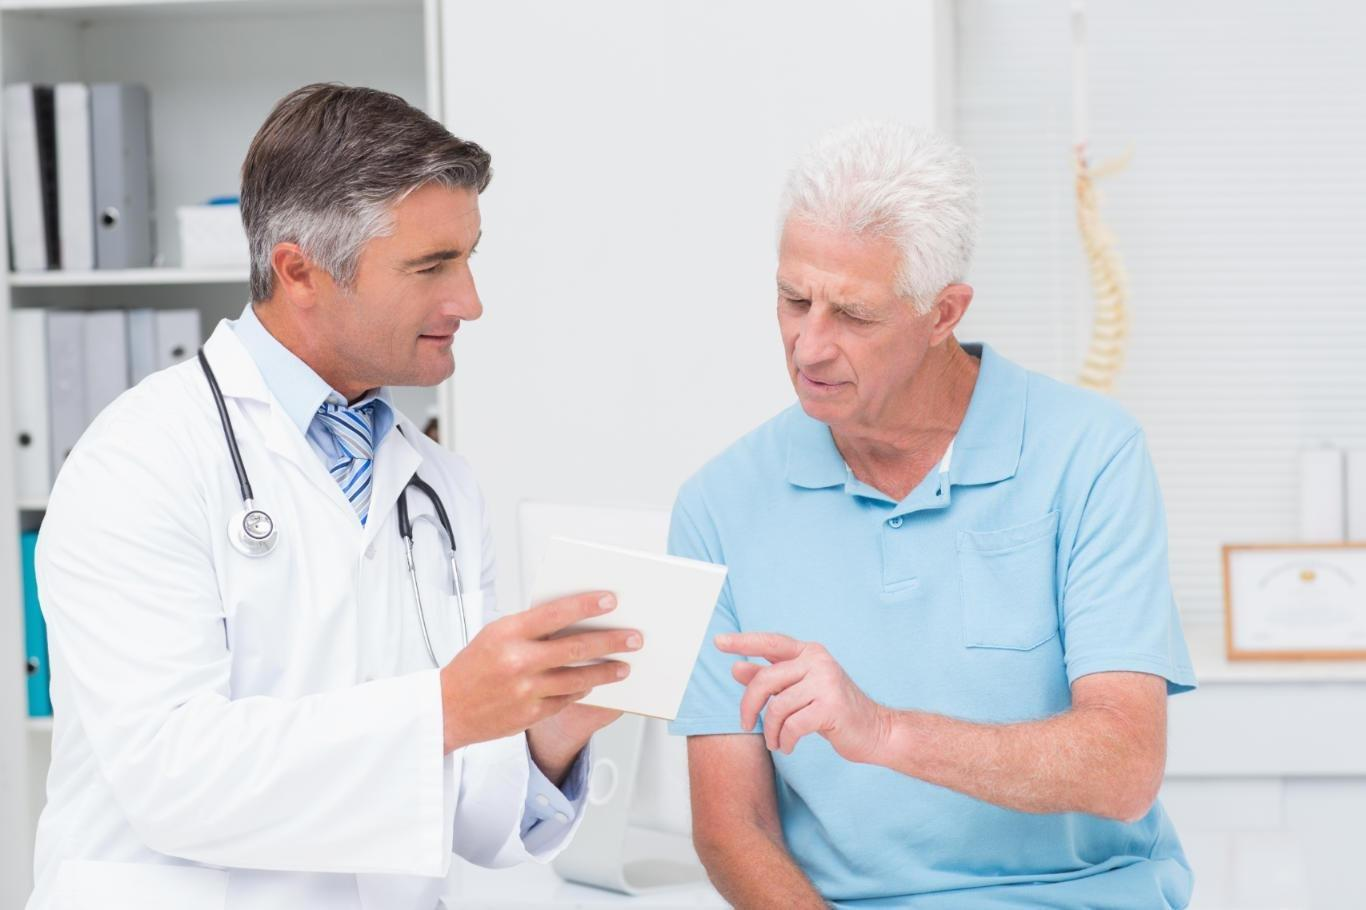 Blood Tests For Diabetes: Fasting Plasma Glucose Test